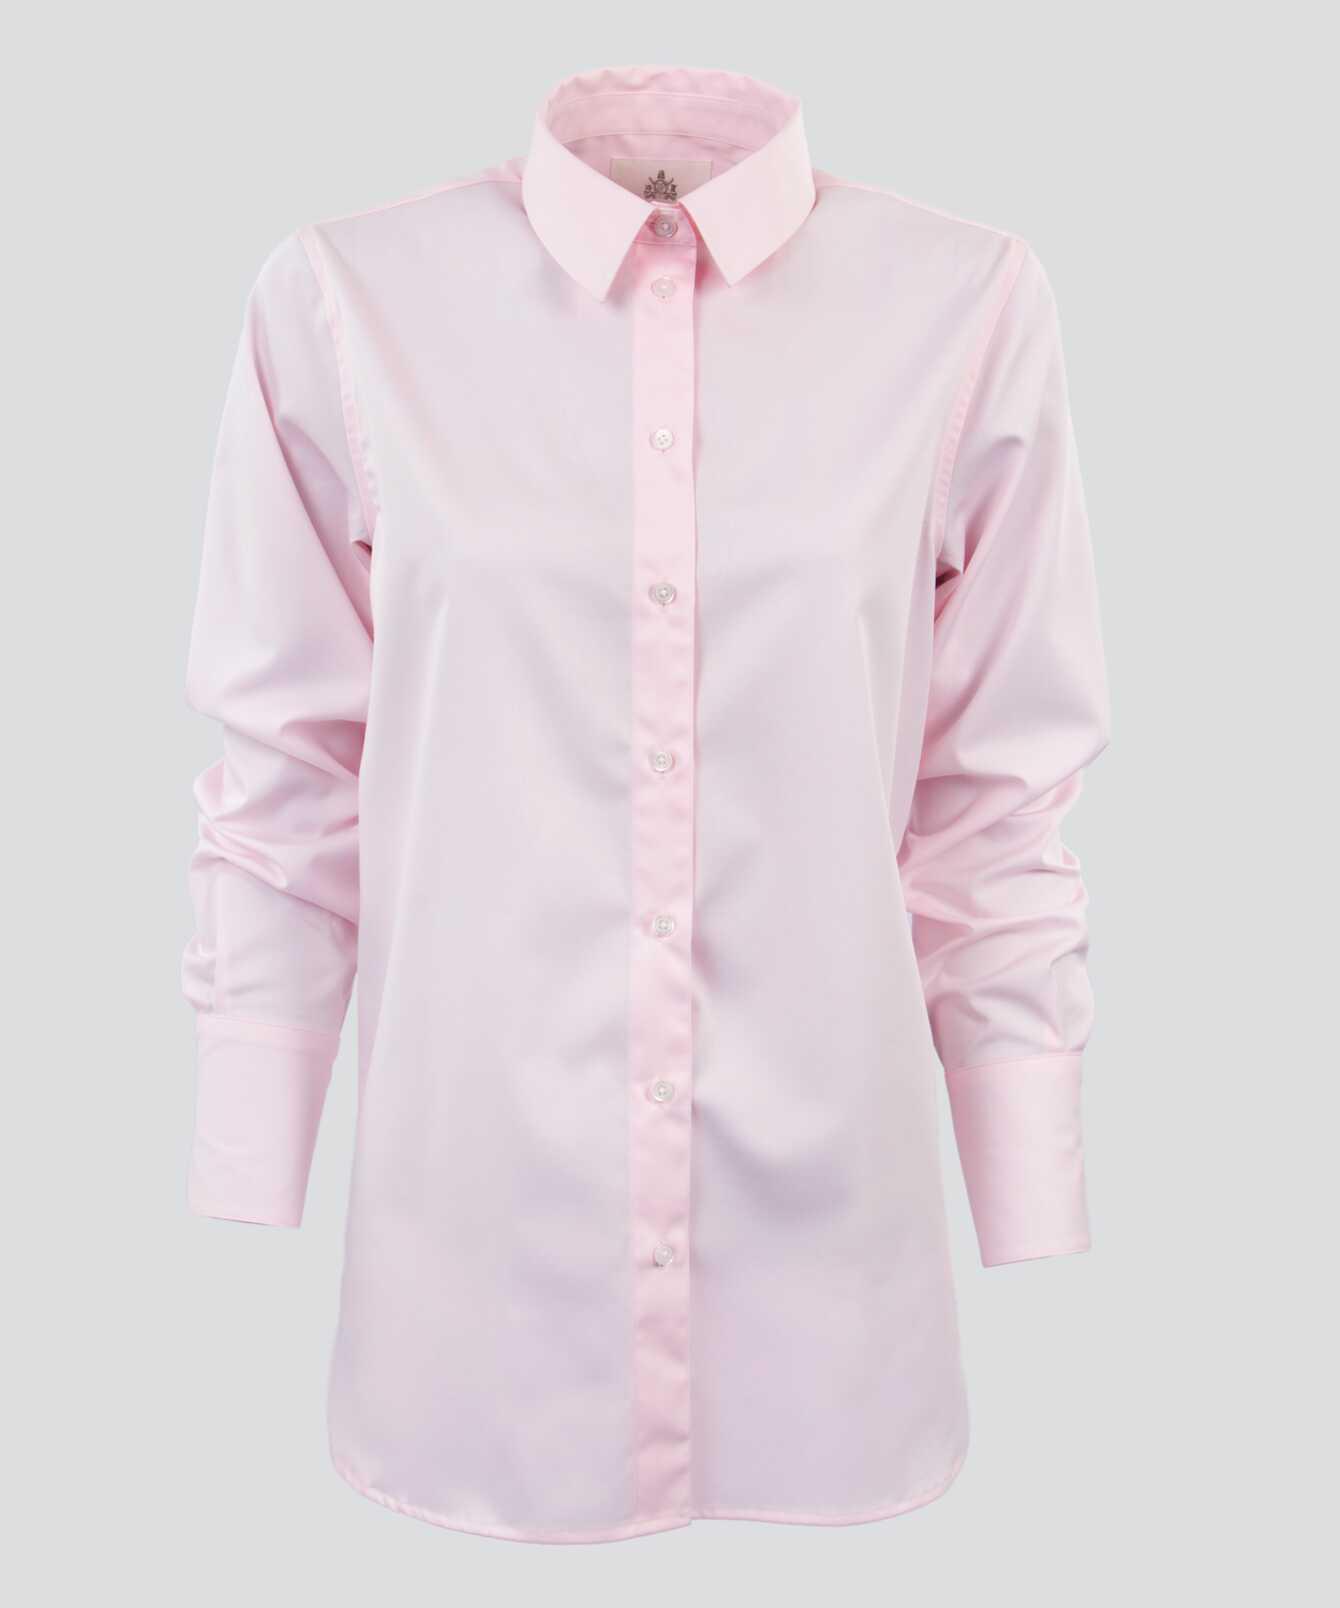 Shirt Nova Rosa The Shirt Factory